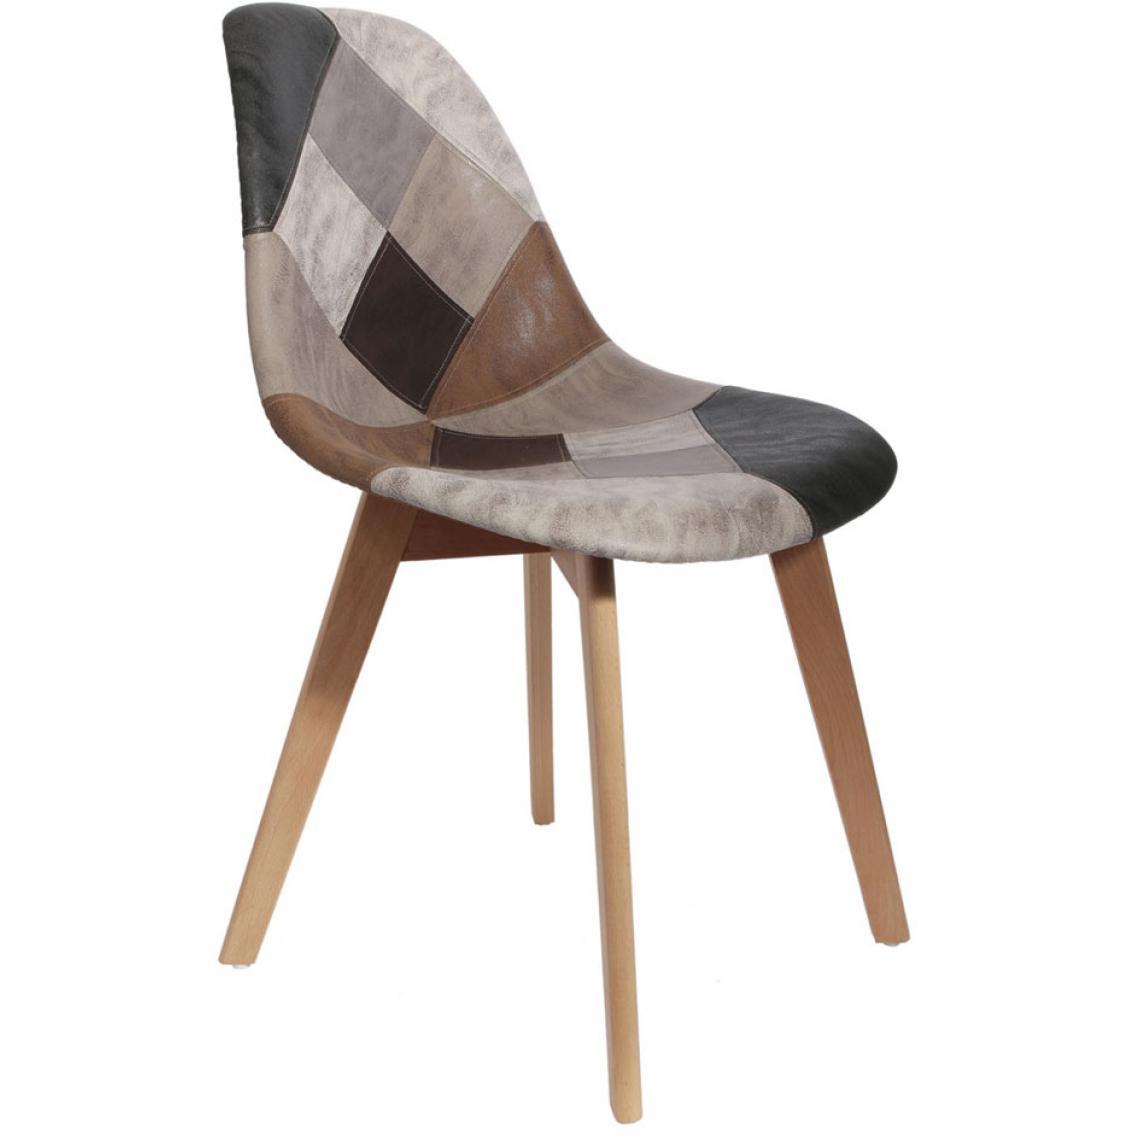 chaise scandinave patchwork marron fjord